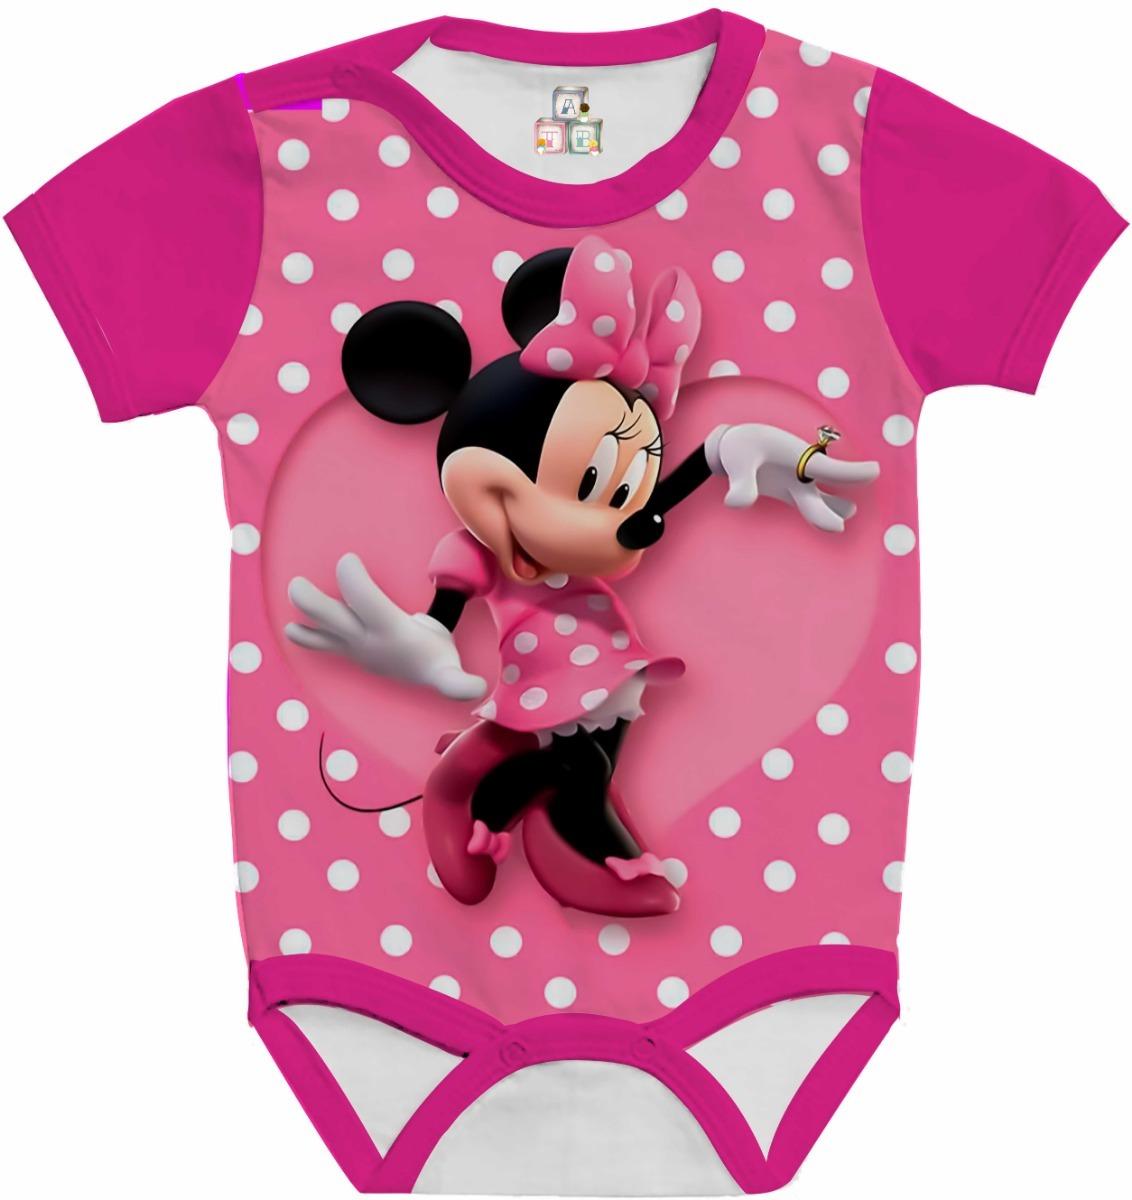 ca7ca68f7 body bebê camiseta infantil personalizada minnie mouse hd 08. Carregando  zoom.